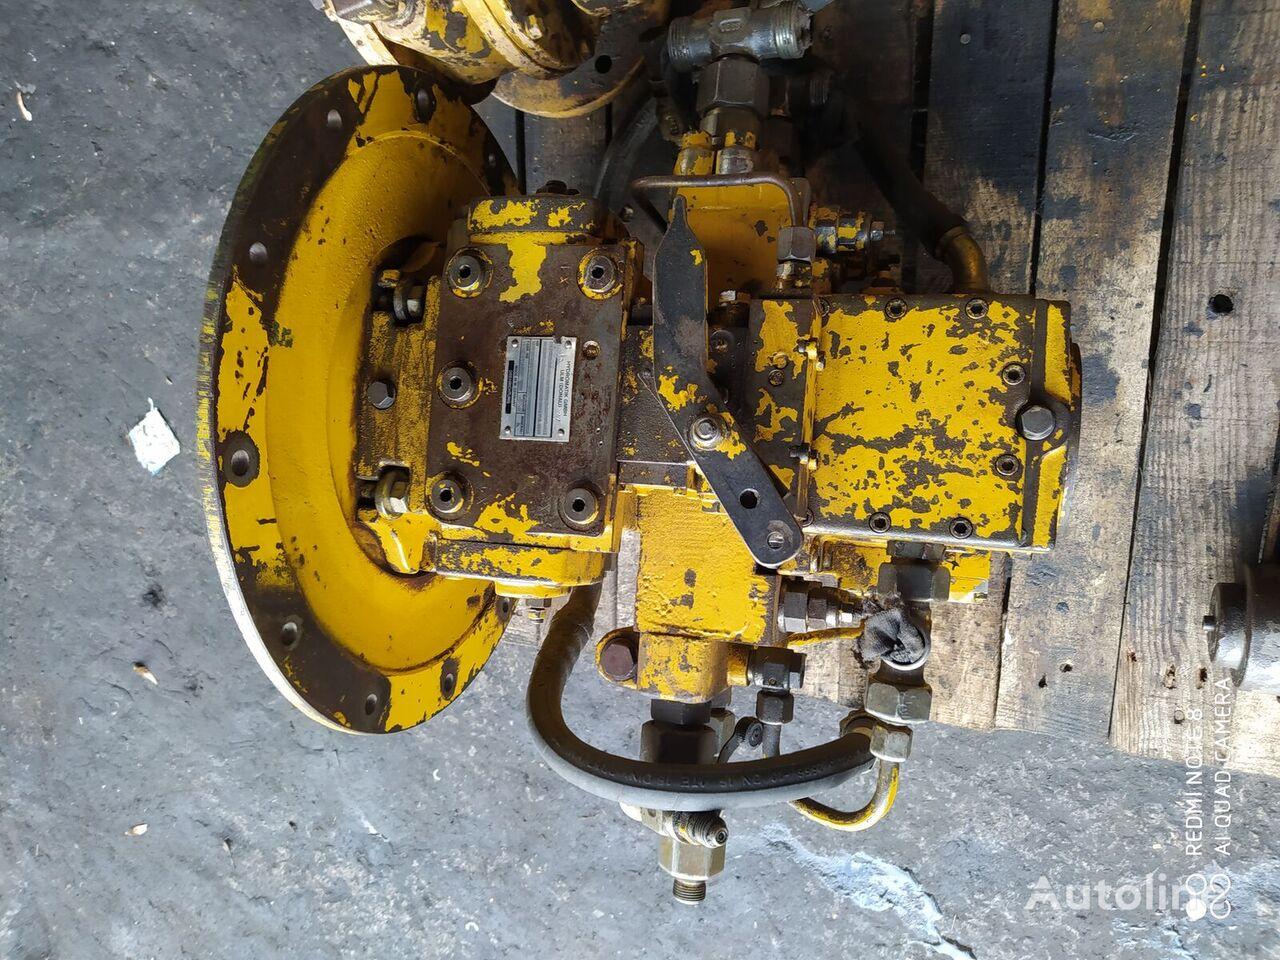 HYDROMATIK A4 VG 56 H WD1 / A4VG28E hydraulic pump for backhoe loader